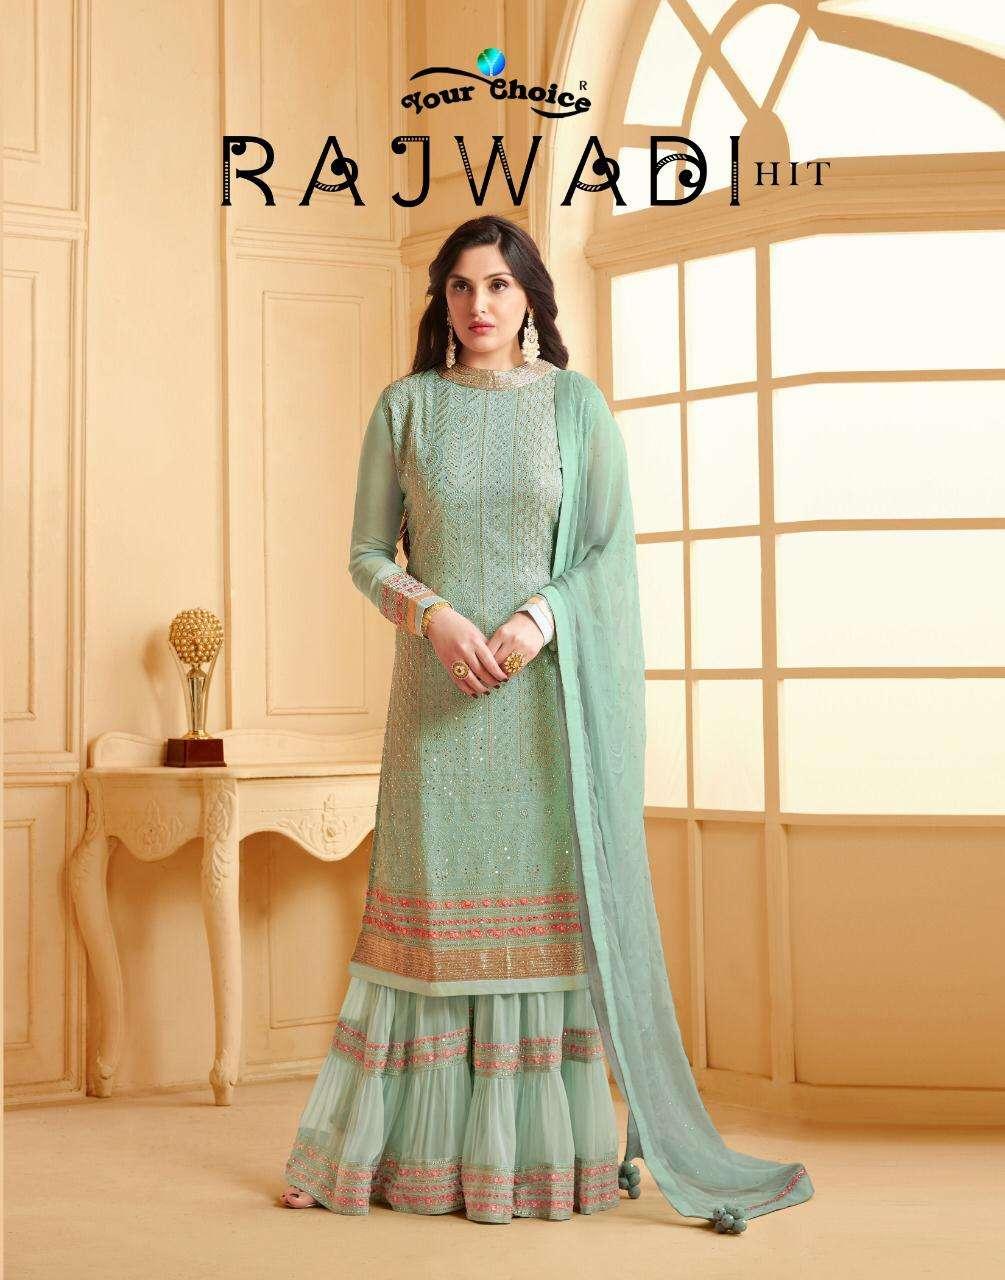 Your Choice Rajwadi Hits Georgette Lakhnawi Sharara Suits